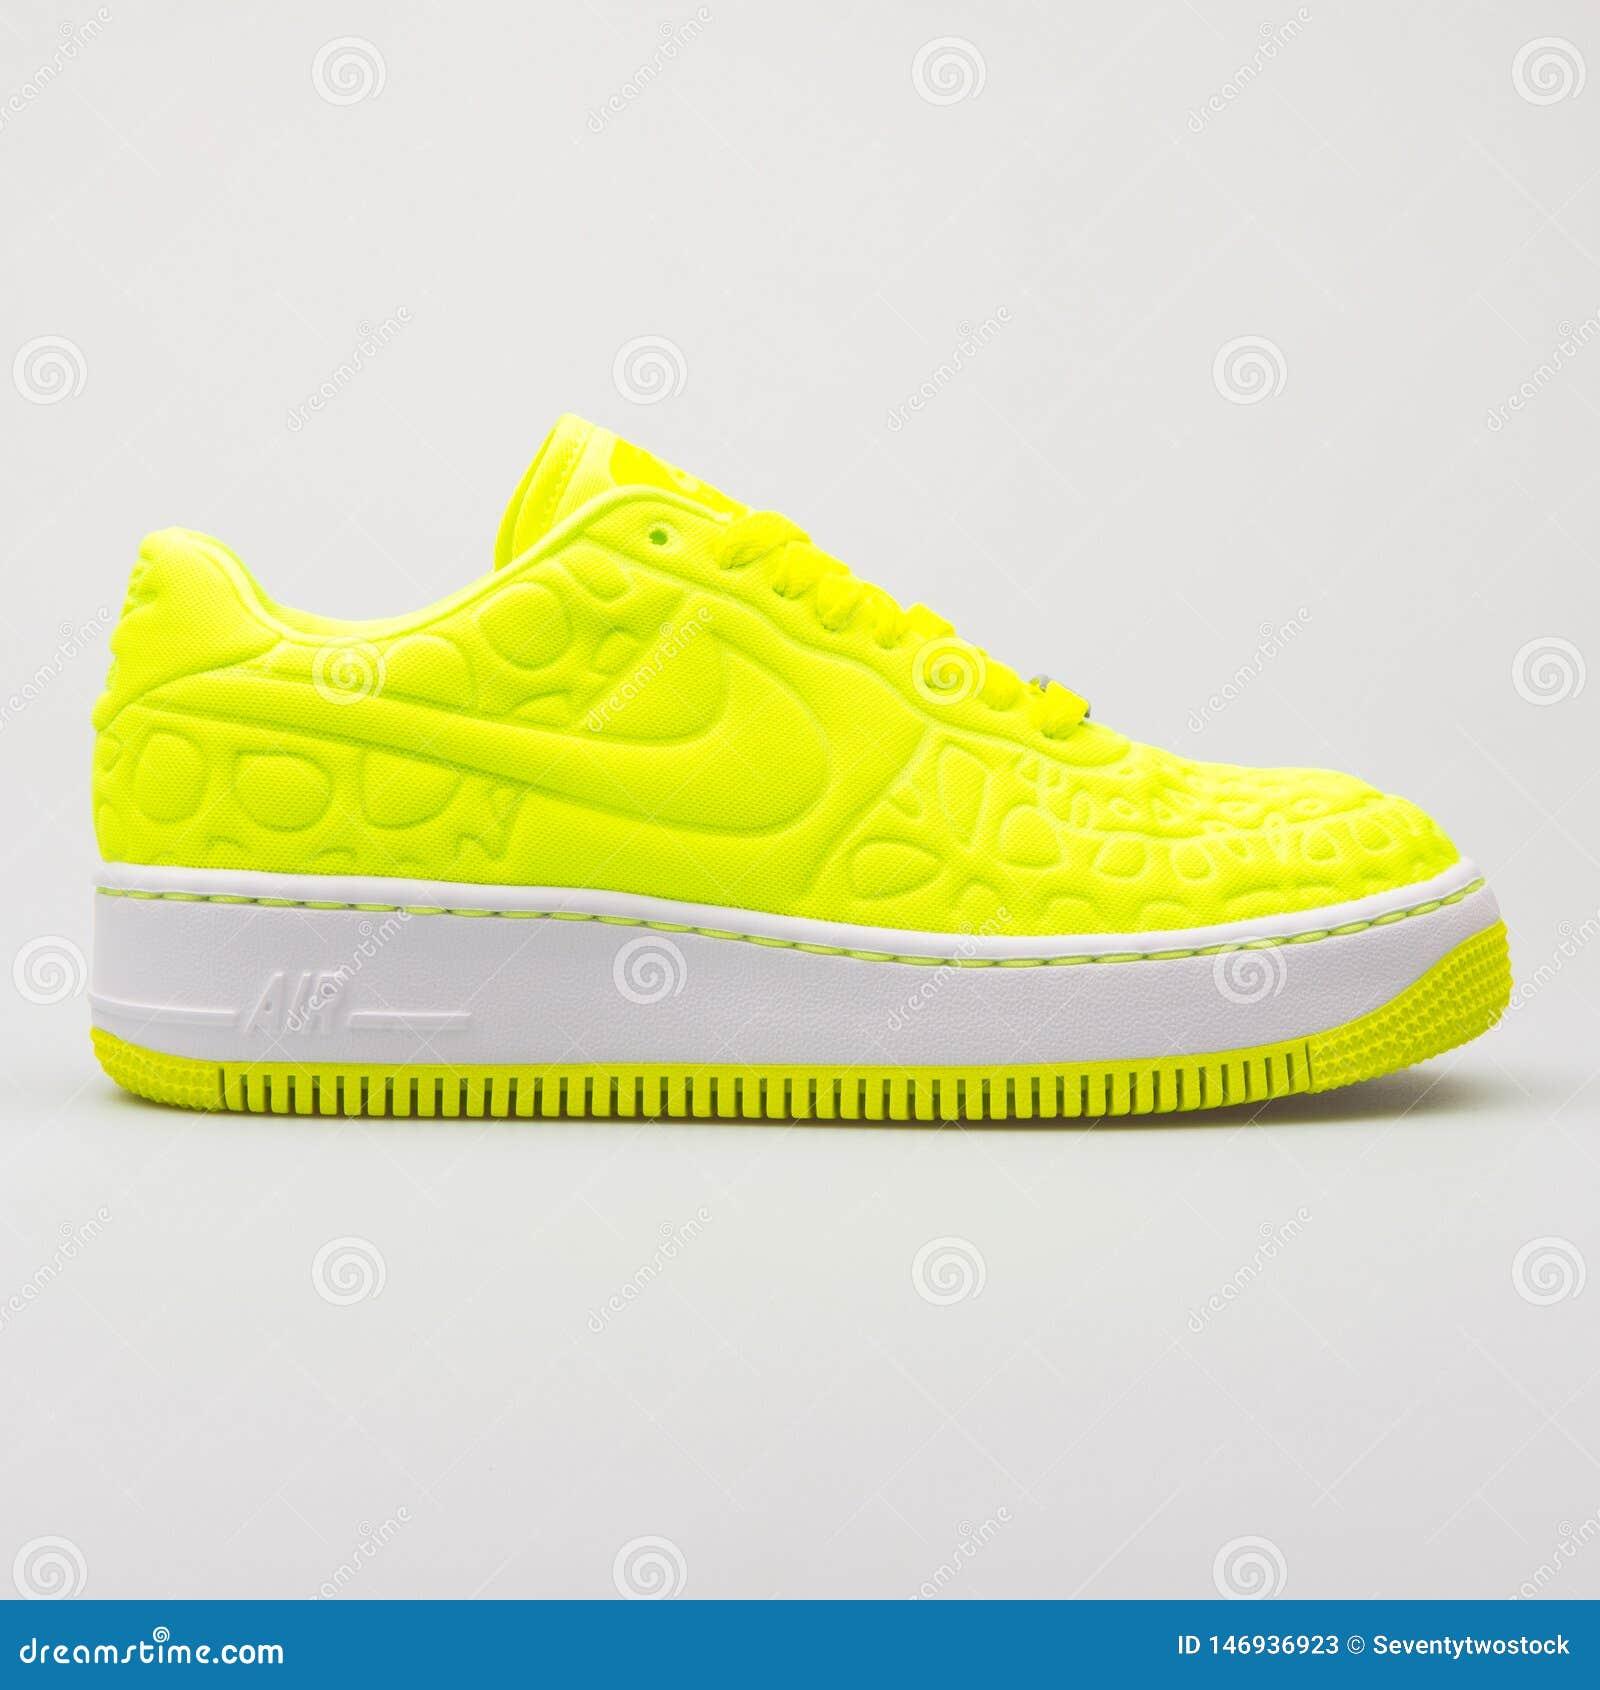 Nike Air Force 1 Upstep-de volt gele tennisschoen van SE